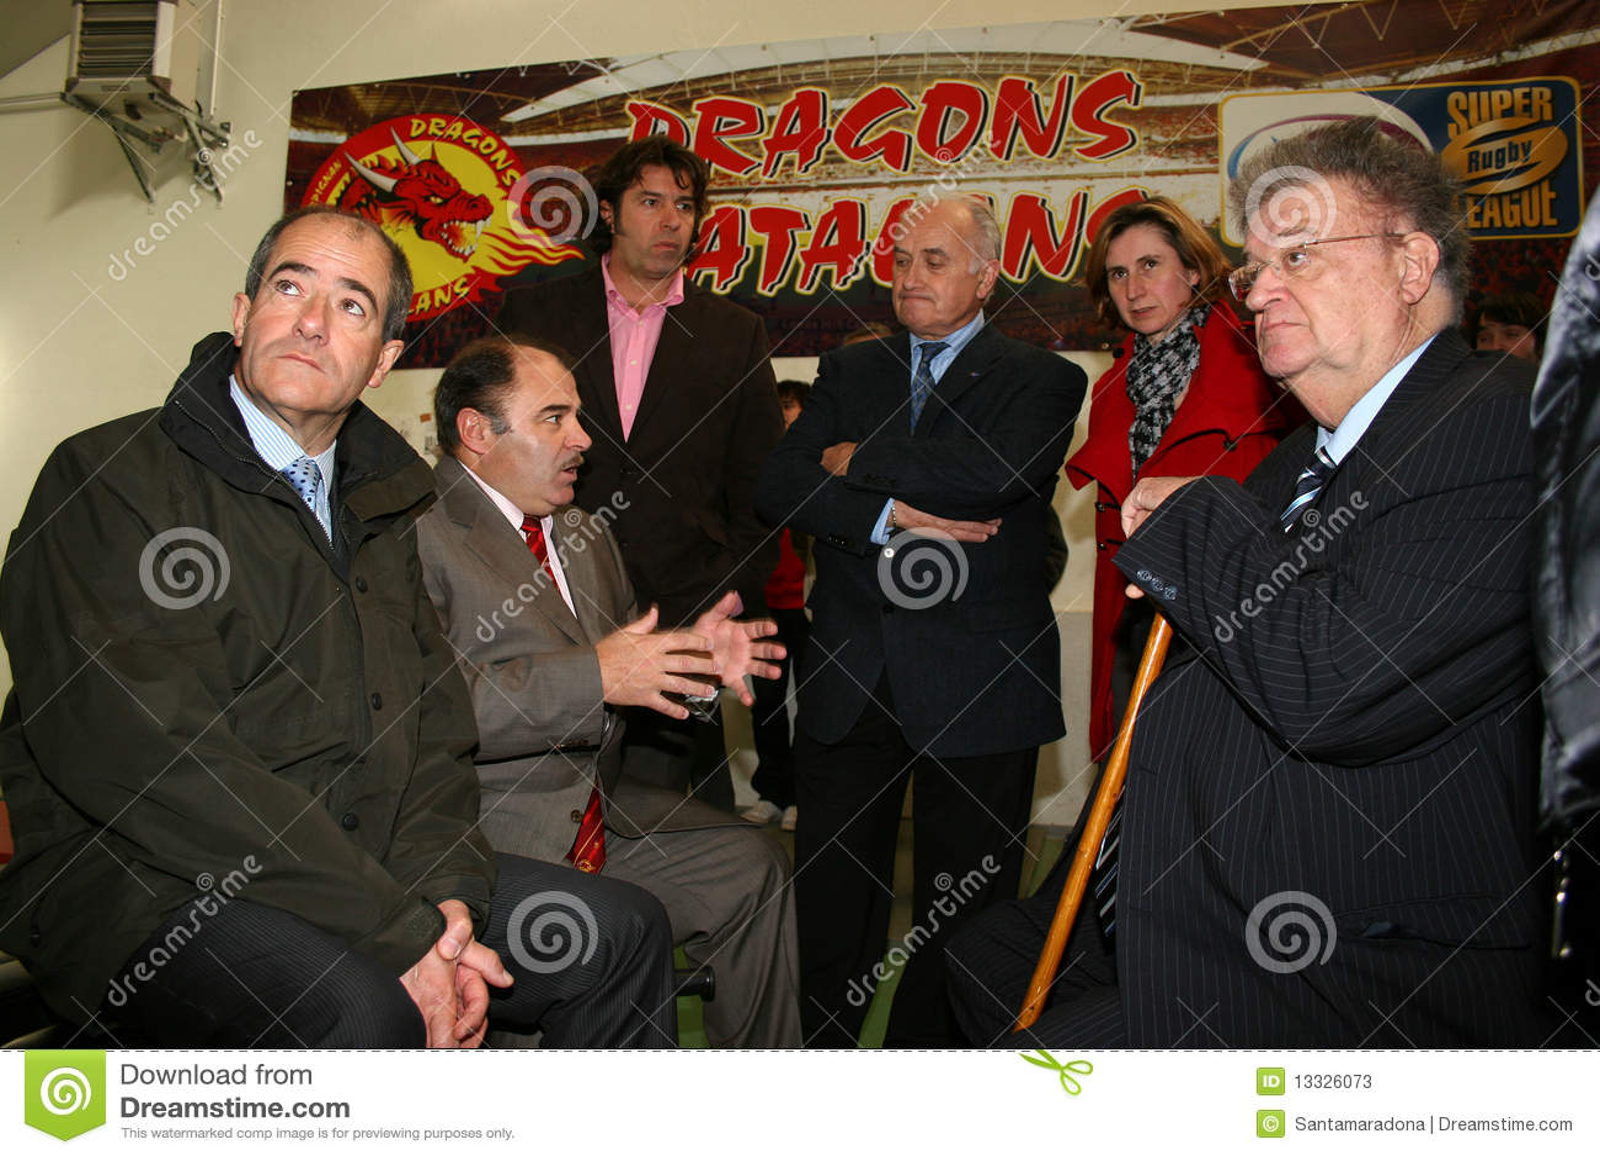 Bourquin freche francuski polityk s